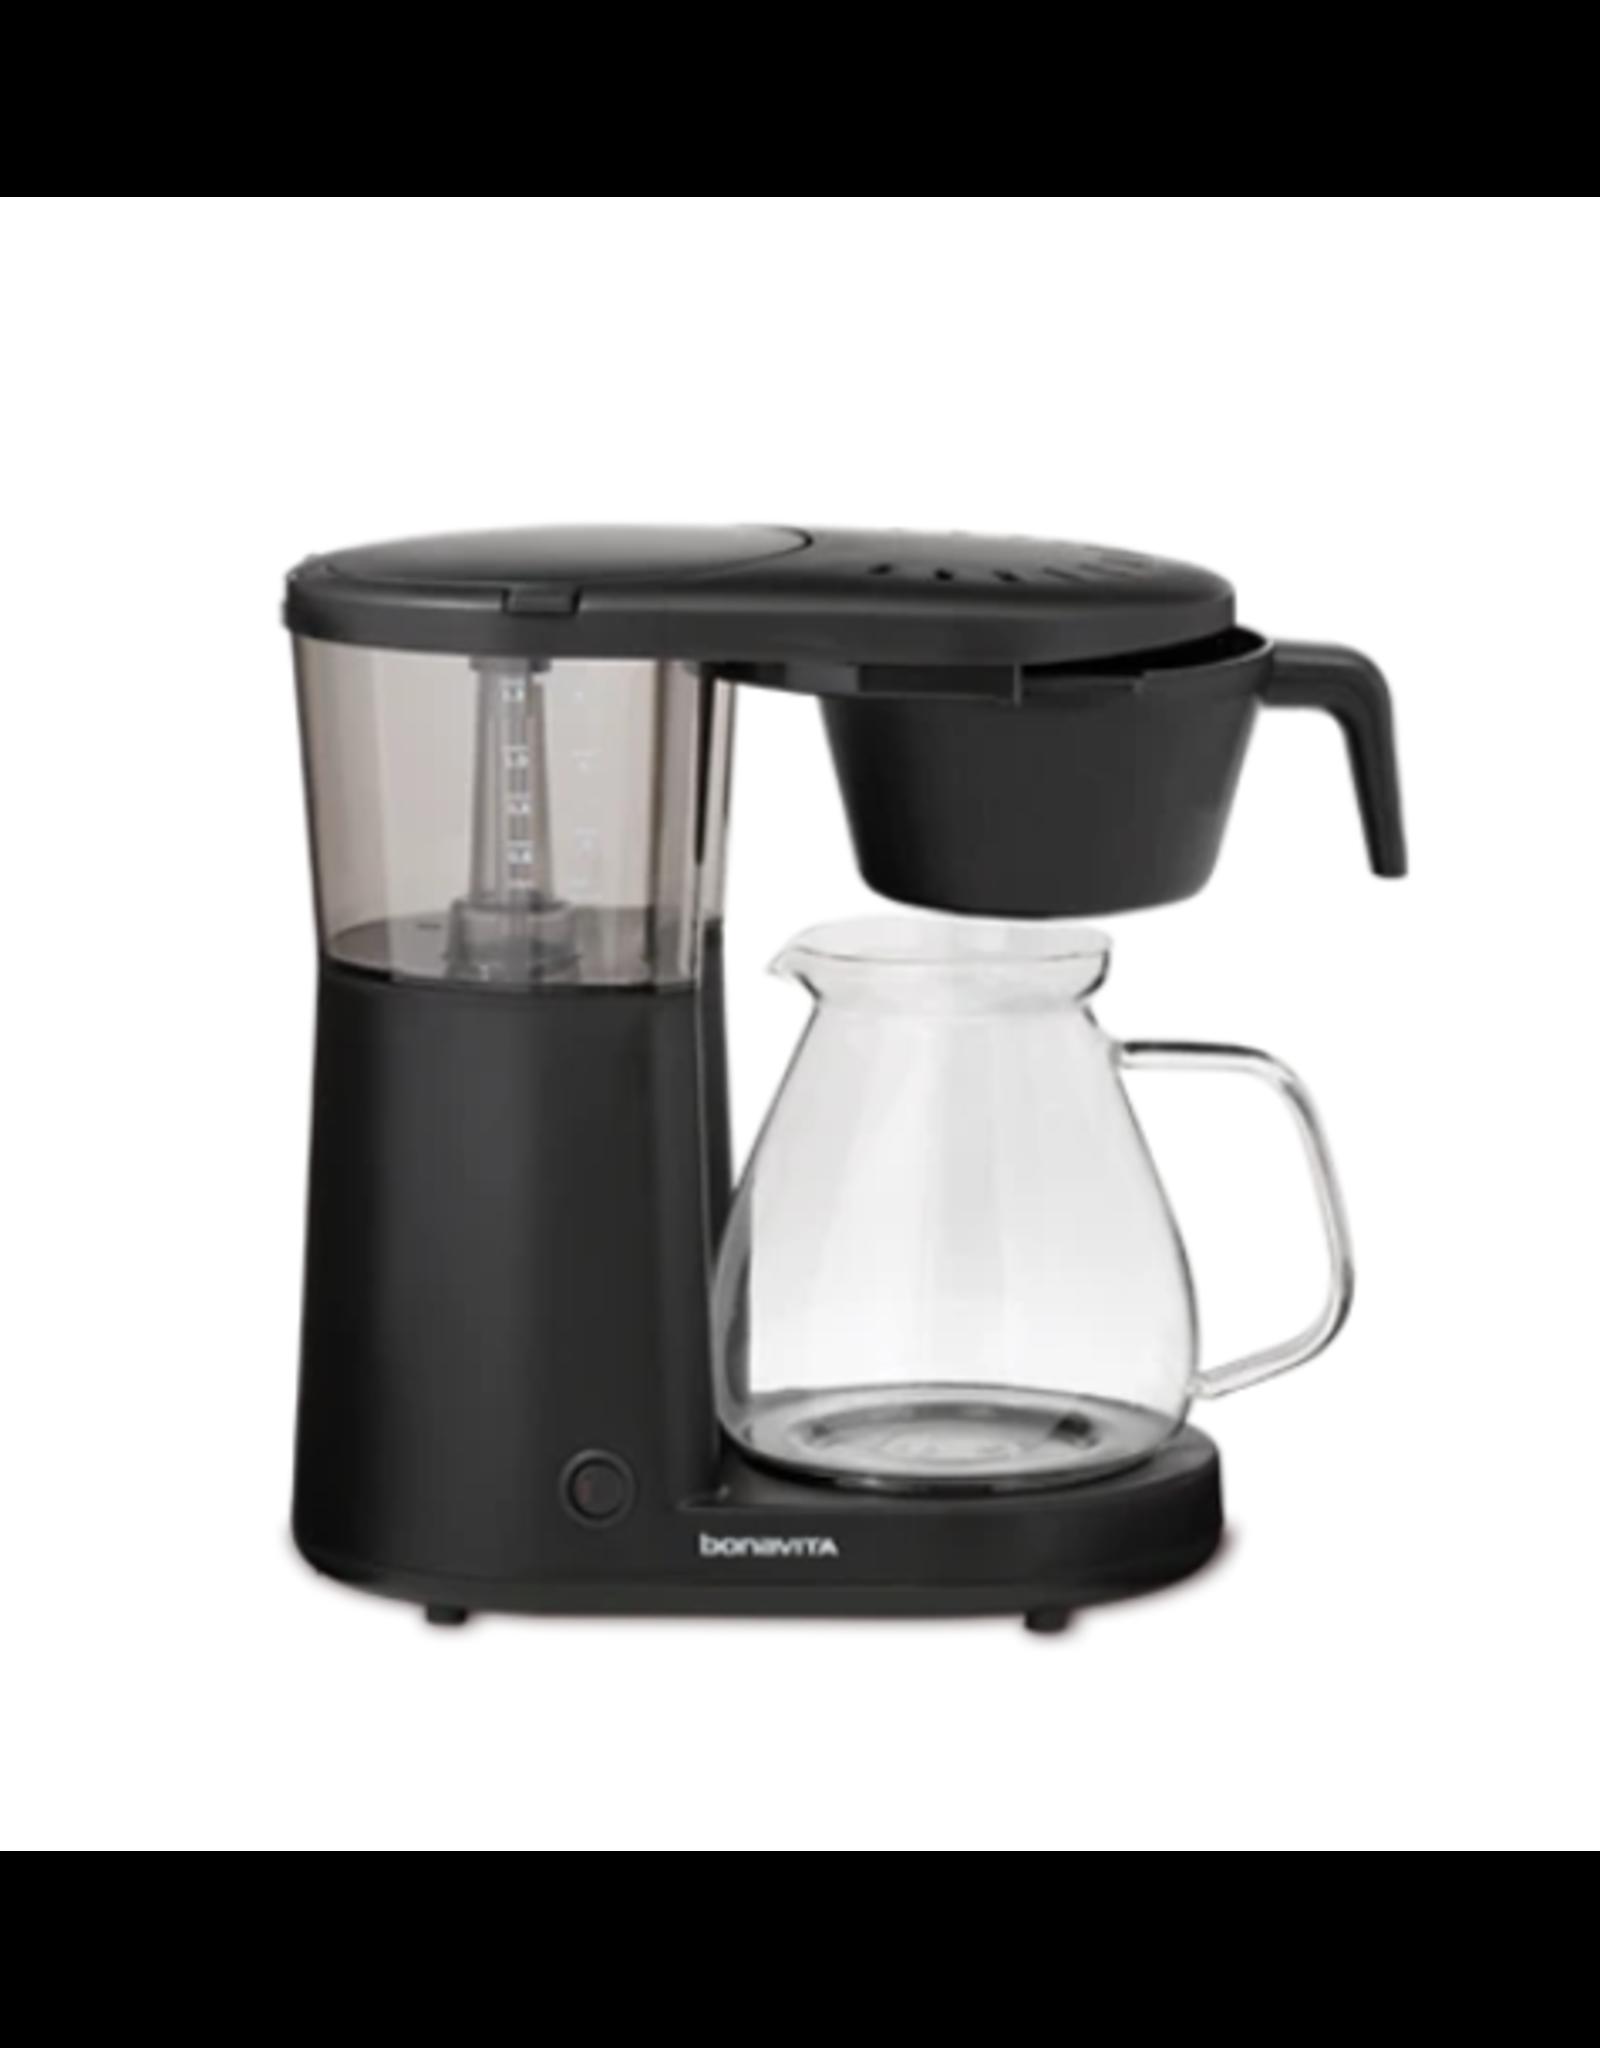 Bonavita Bonavita Metropolitan One-Touch Coffee Brewer 8 Cup